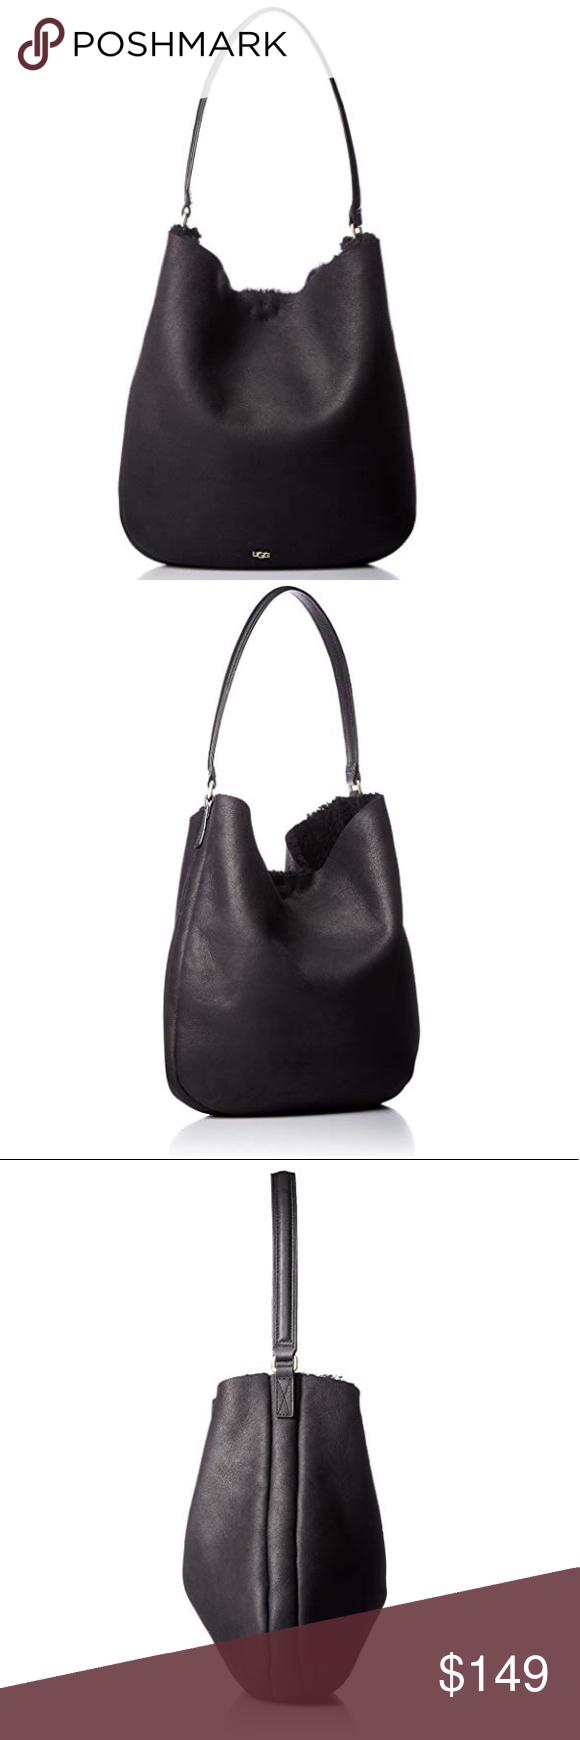 ️New Ugg Claire Hobo Sheepskin Black Bag Last 1 ️New Ugg